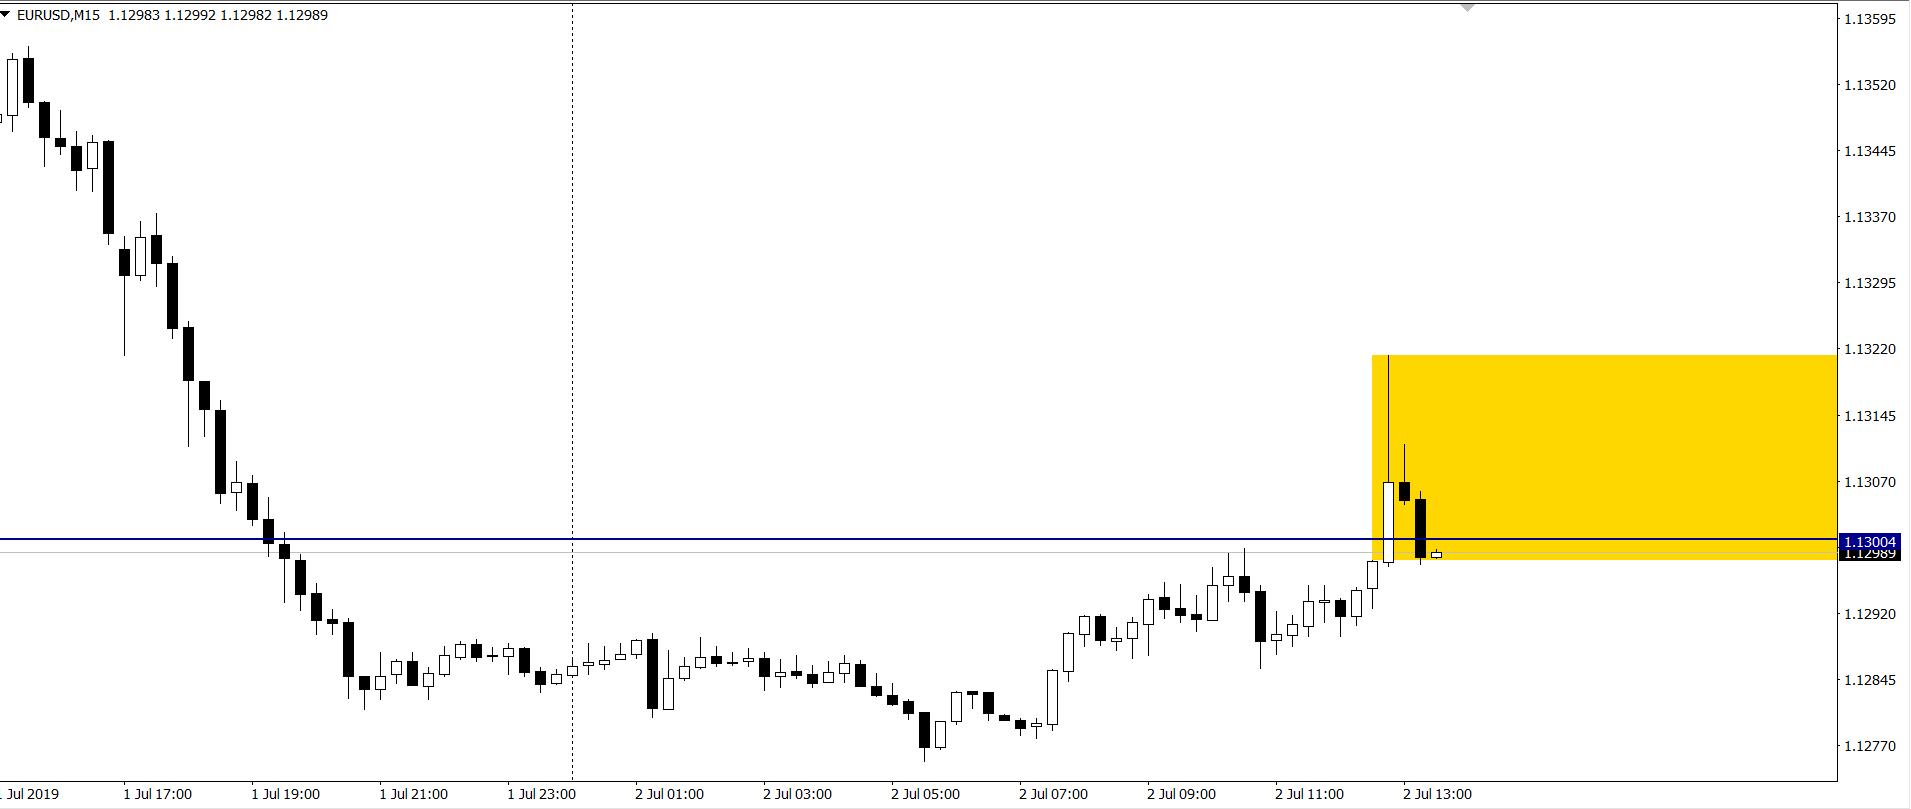 Kurs euro do dolara we wtorek na interwale M15 2 7 19